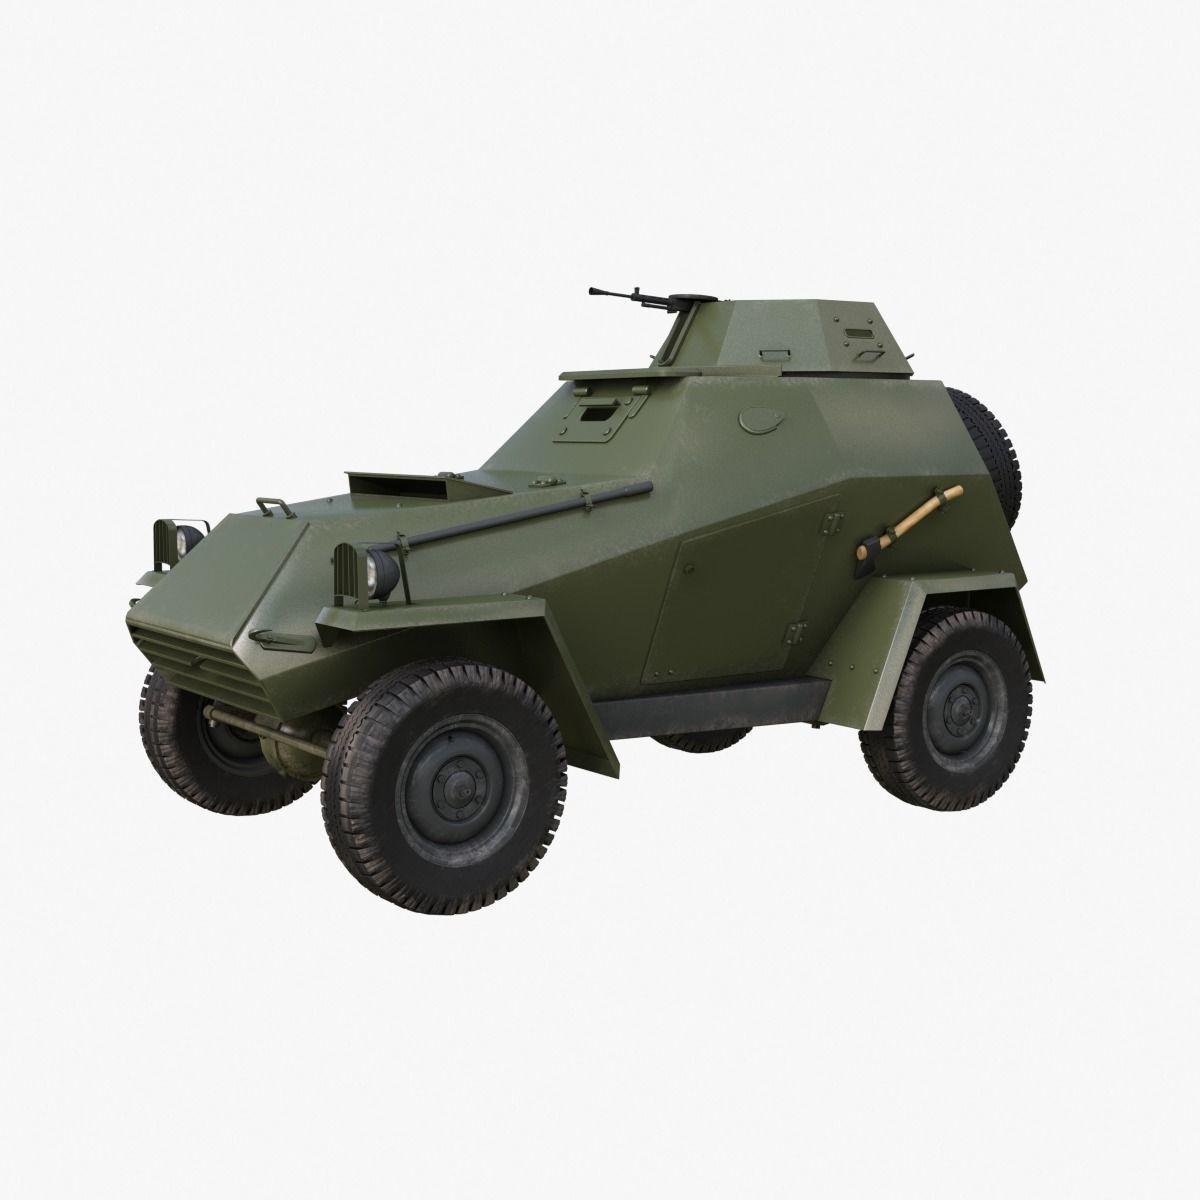 BA 64 Soviet Mental ray